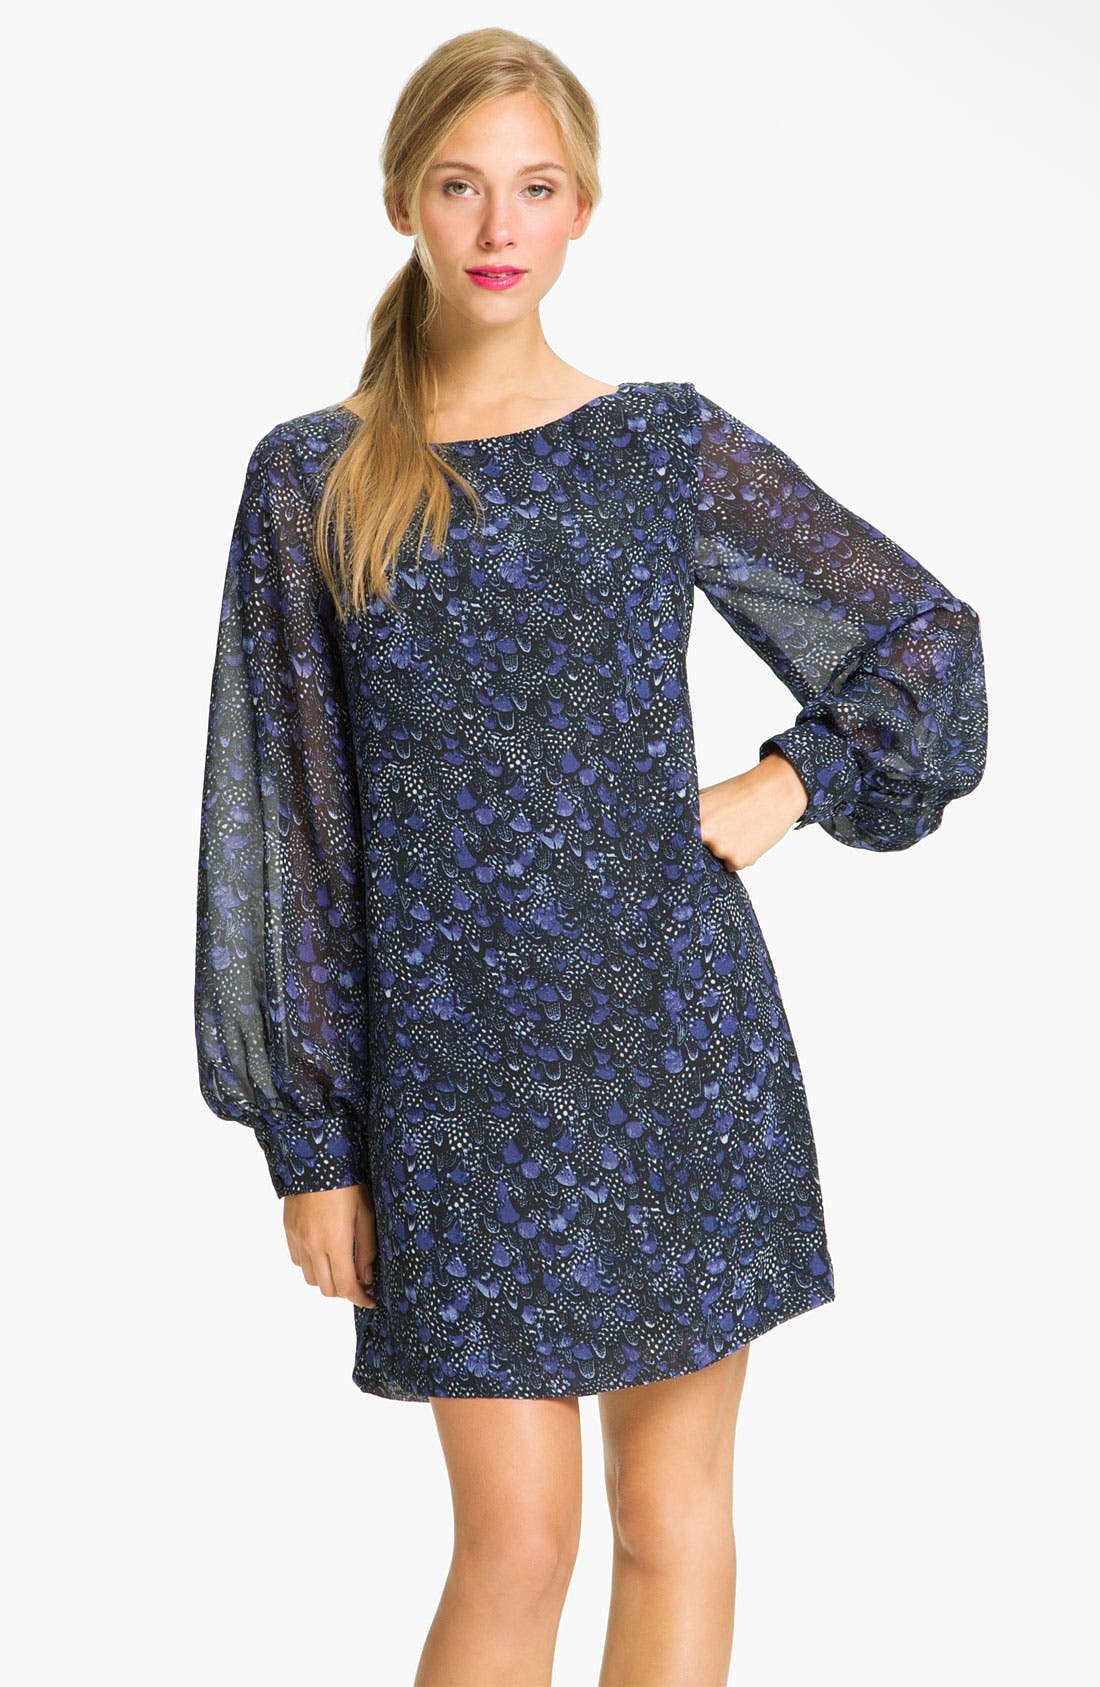 Alternate Image 1 Selected - Donna Morgan Sheer Blouson Sleeve Shift Dress (Petite)